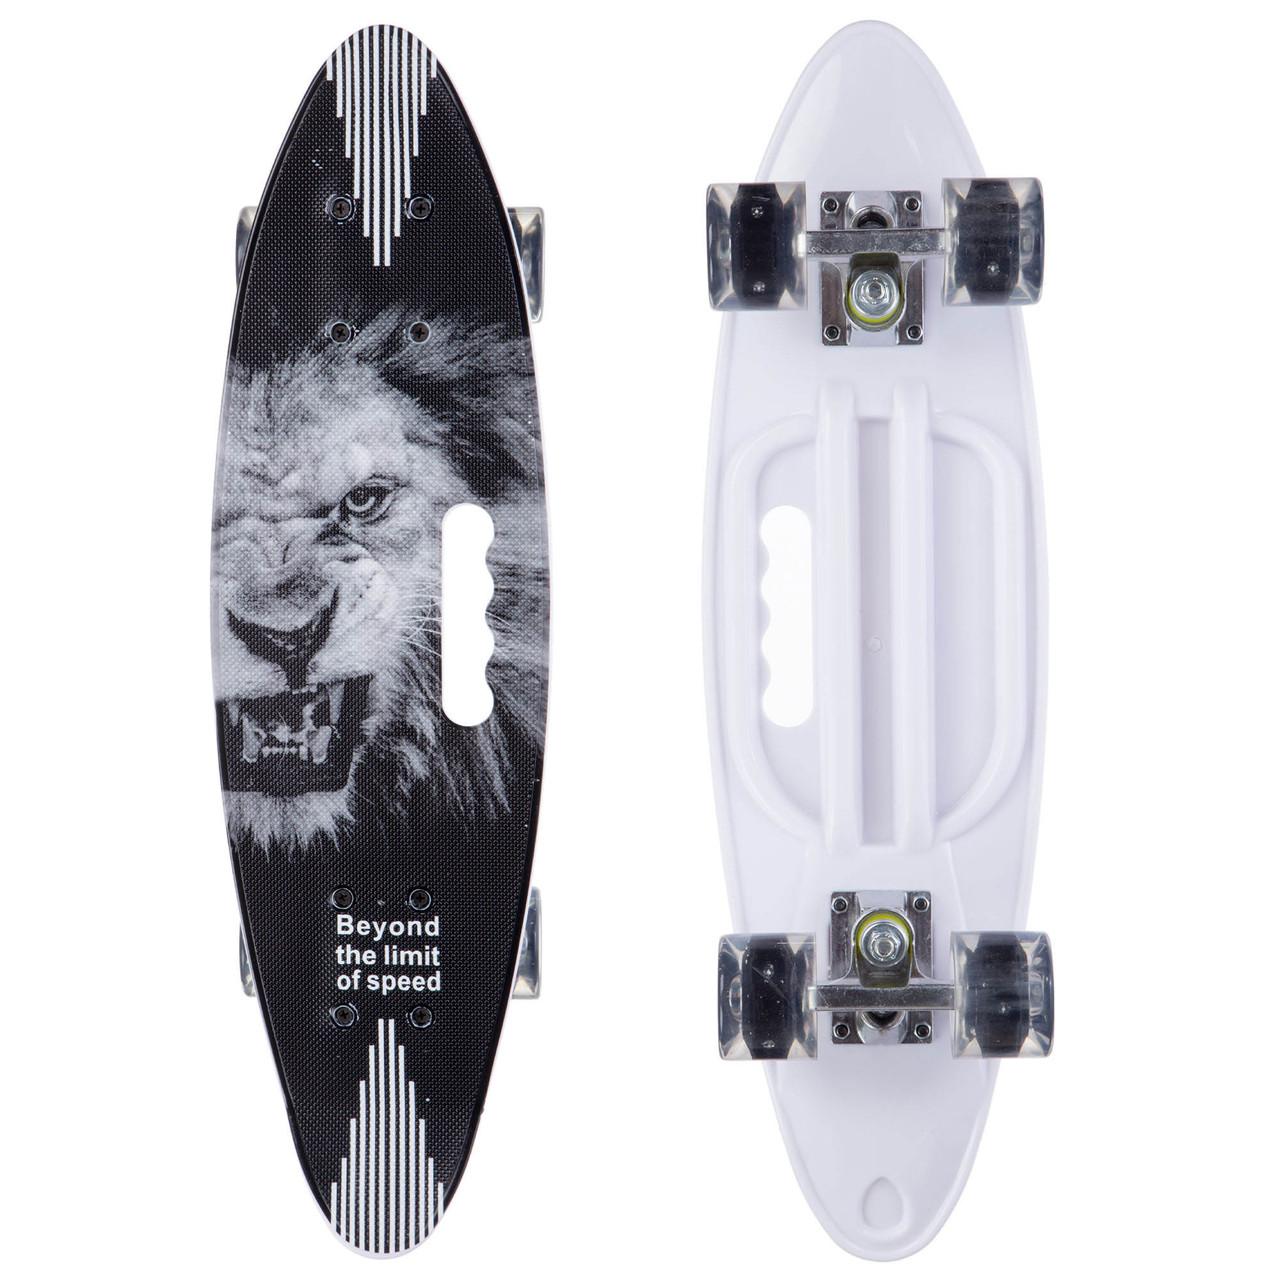 Скейтборд круизер SK-885-2 (PU светящ, р-р 60x17см, черный-белый)